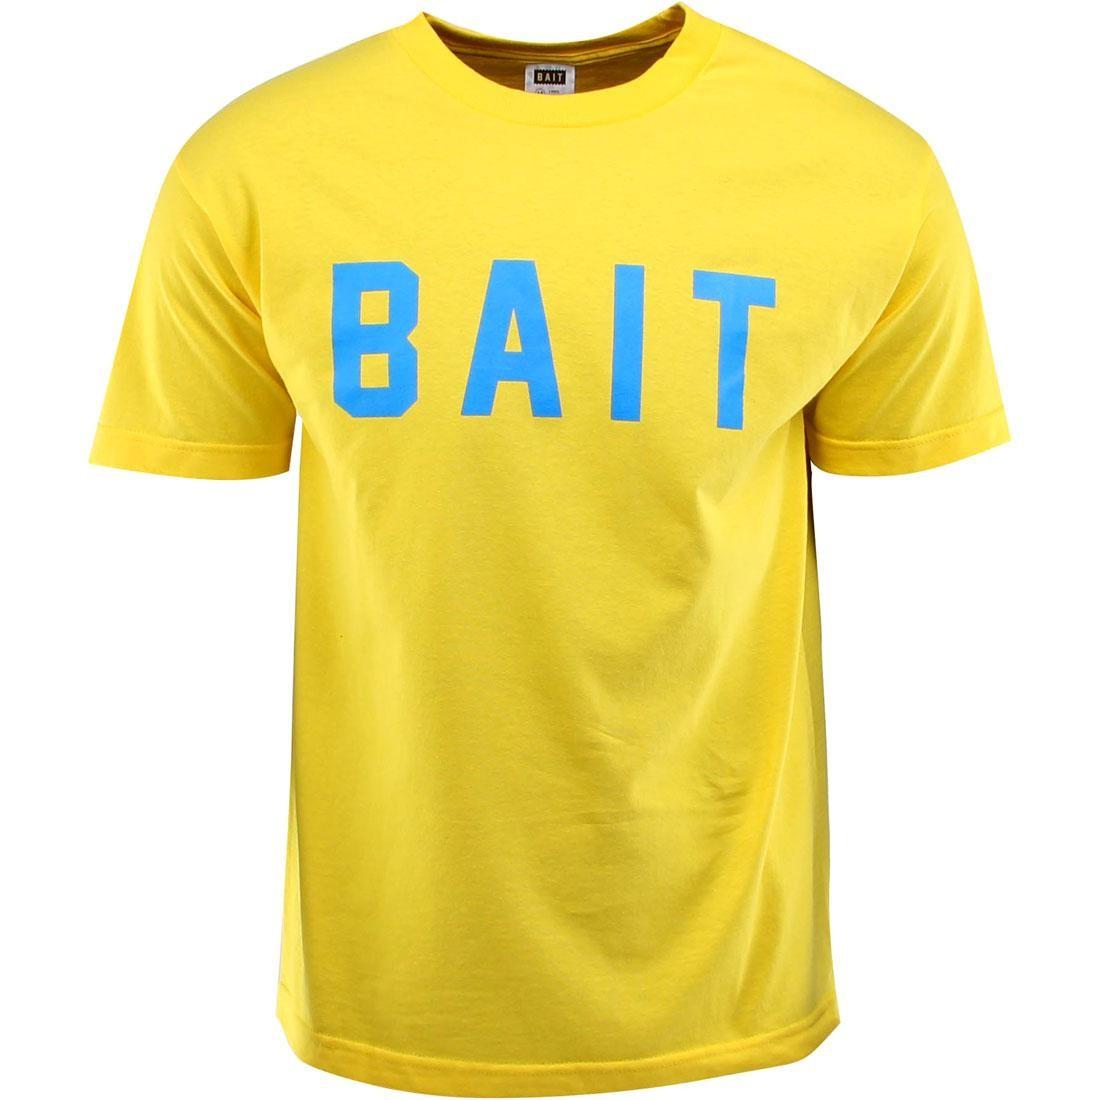 BAIT Logo Tee (yellow / blue)